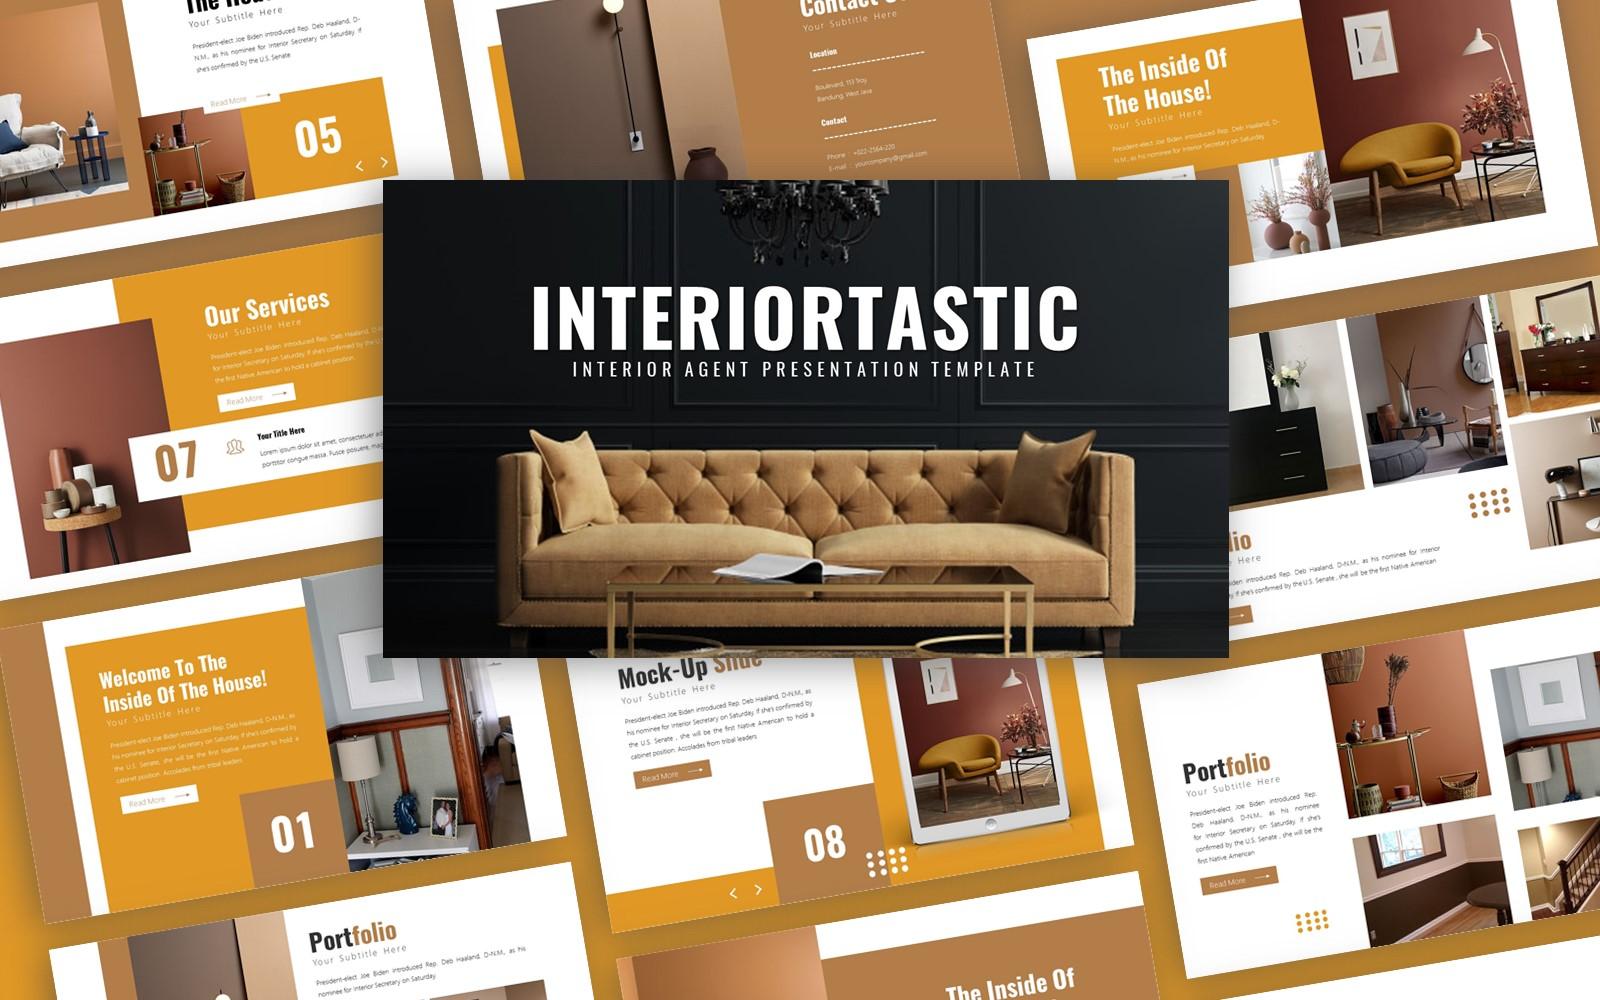 Interiortastic Interior Presentation PowerPoint Template